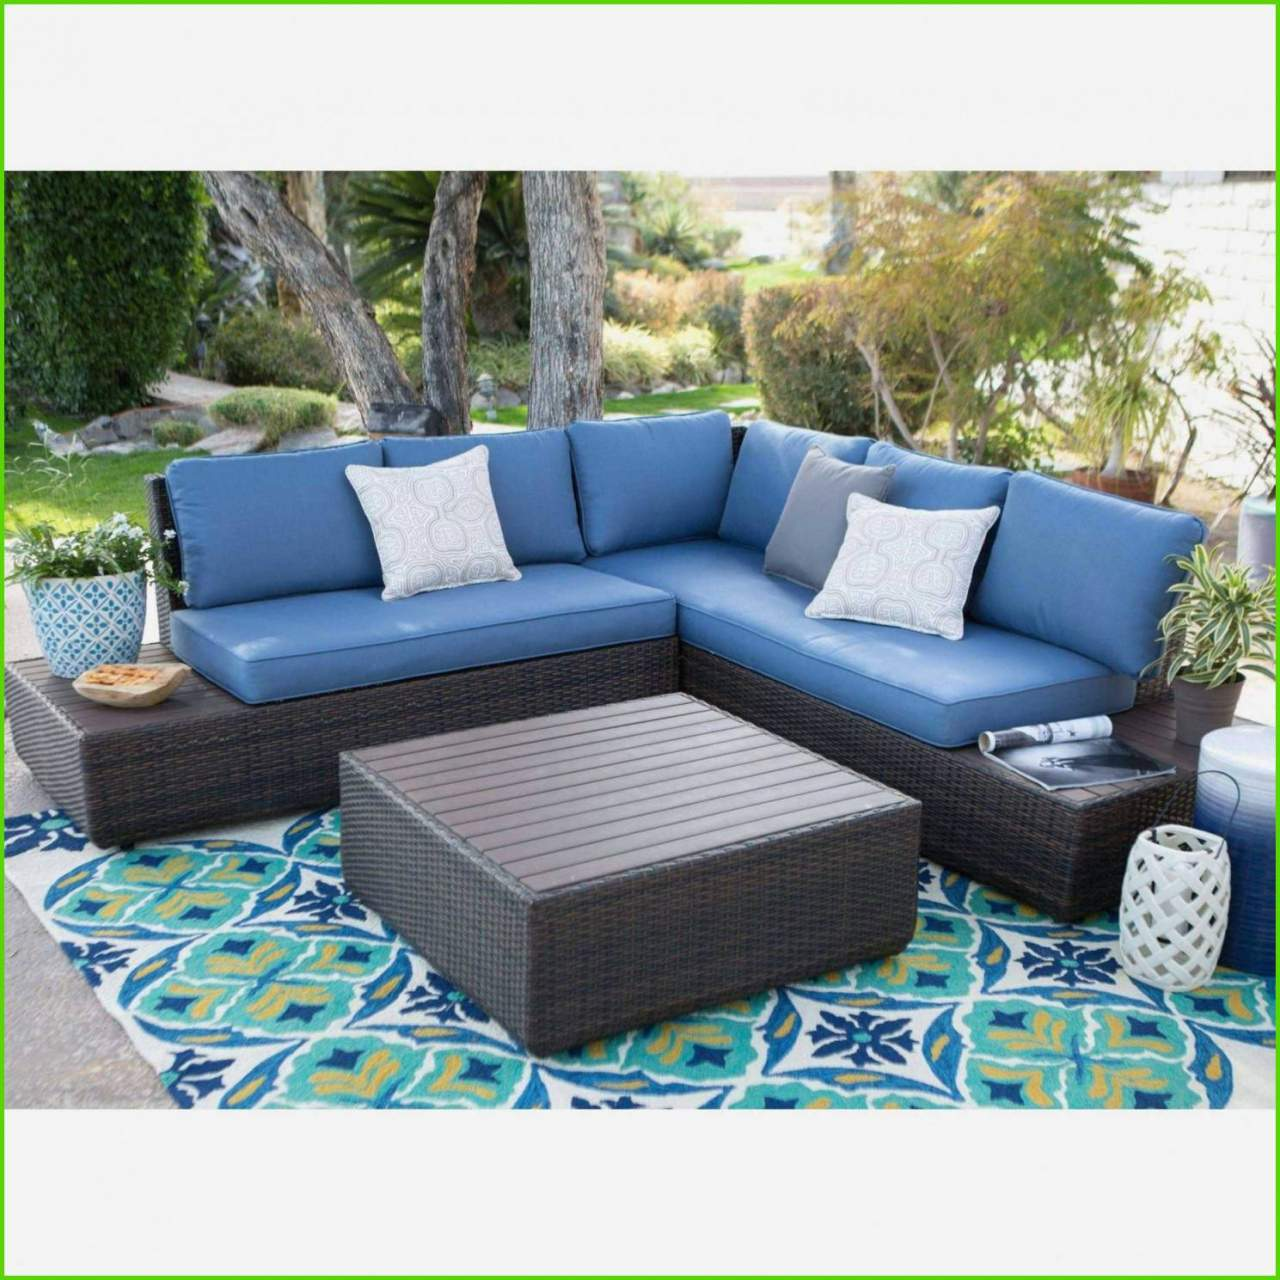 - Garten Sofa Schön Outdoor Daybed — Procura Home Blog Garten Anlegen